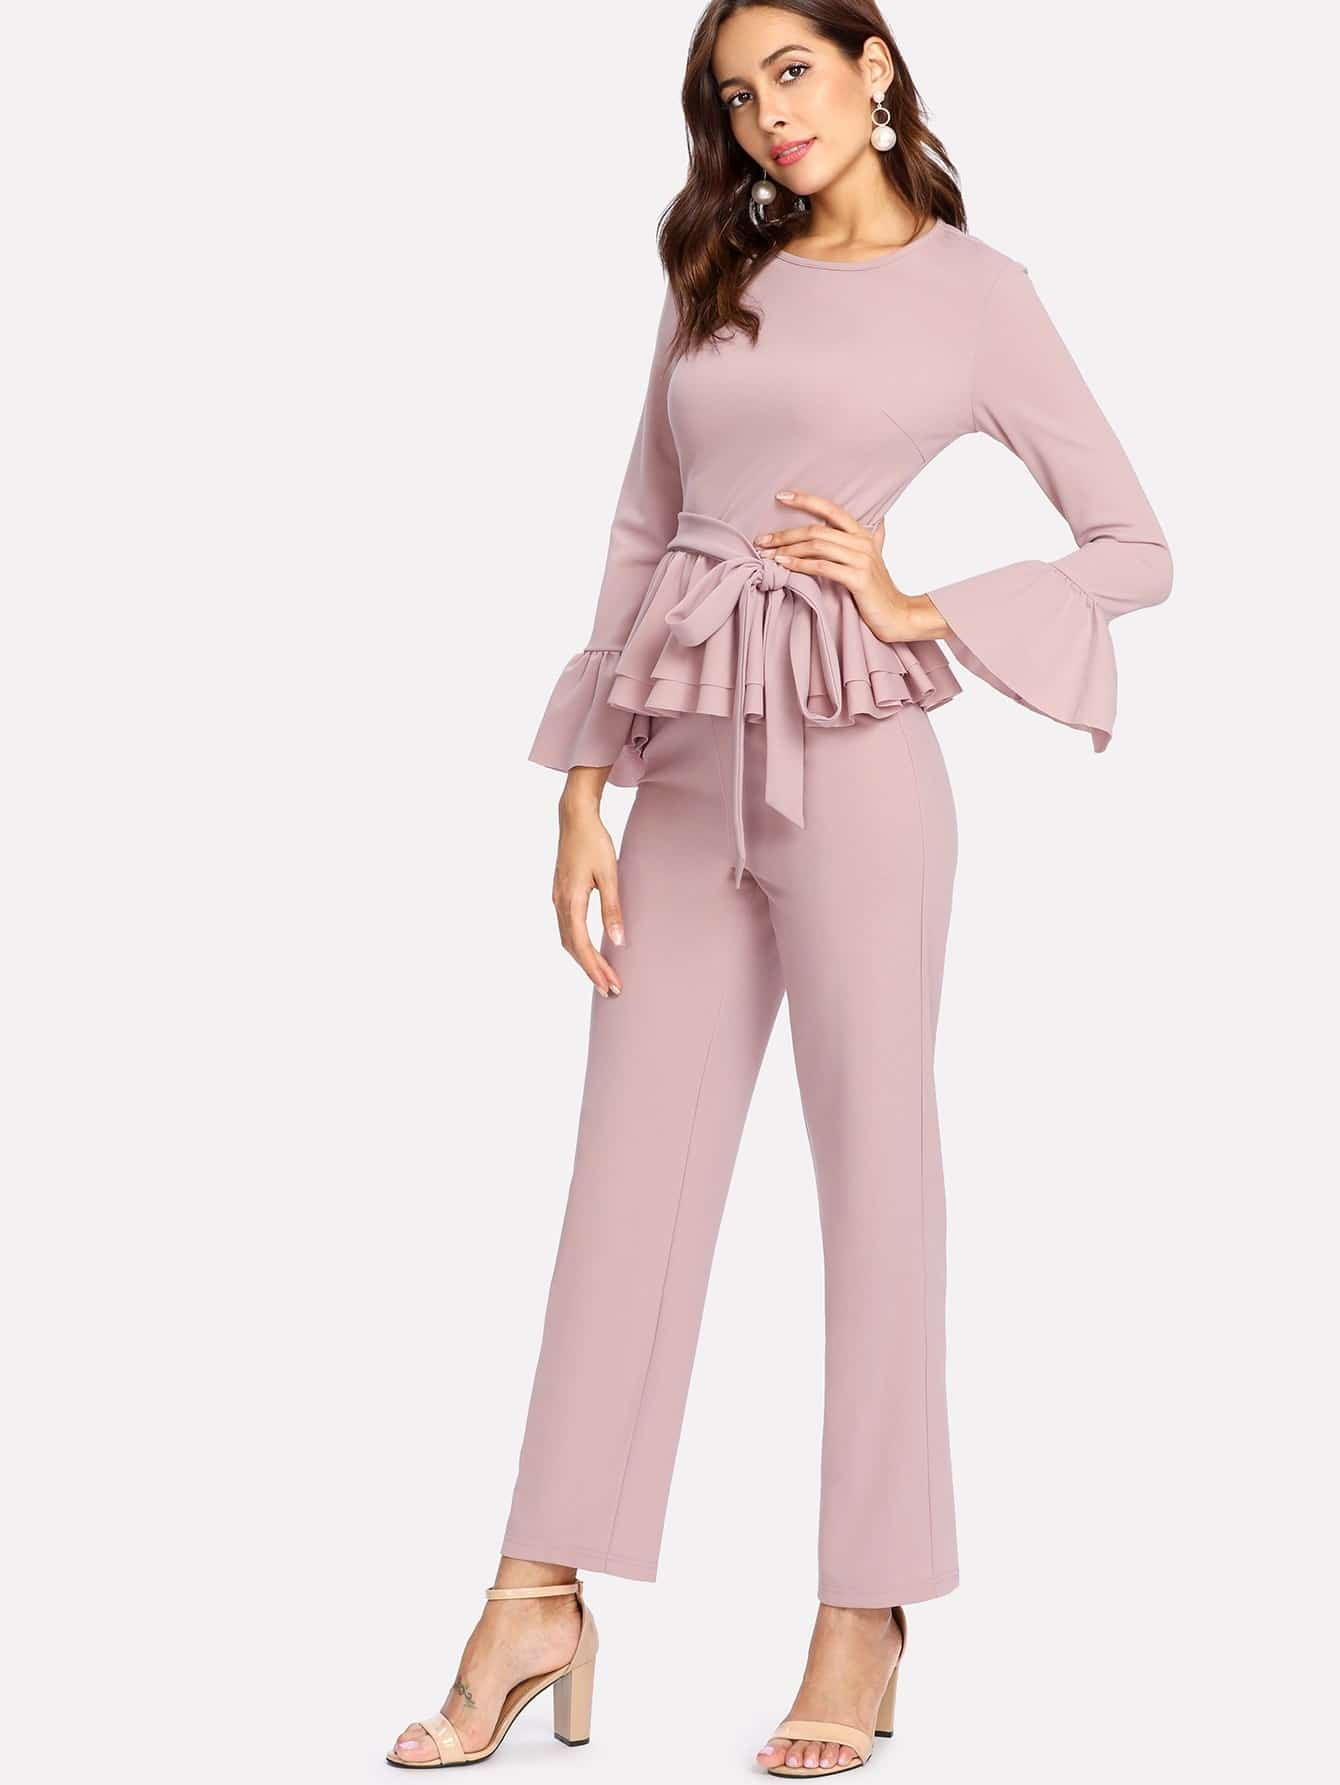 Flounce Cuff And Hem Self Belted Top & Pants Set flounce hem belted pinstripe cami dress